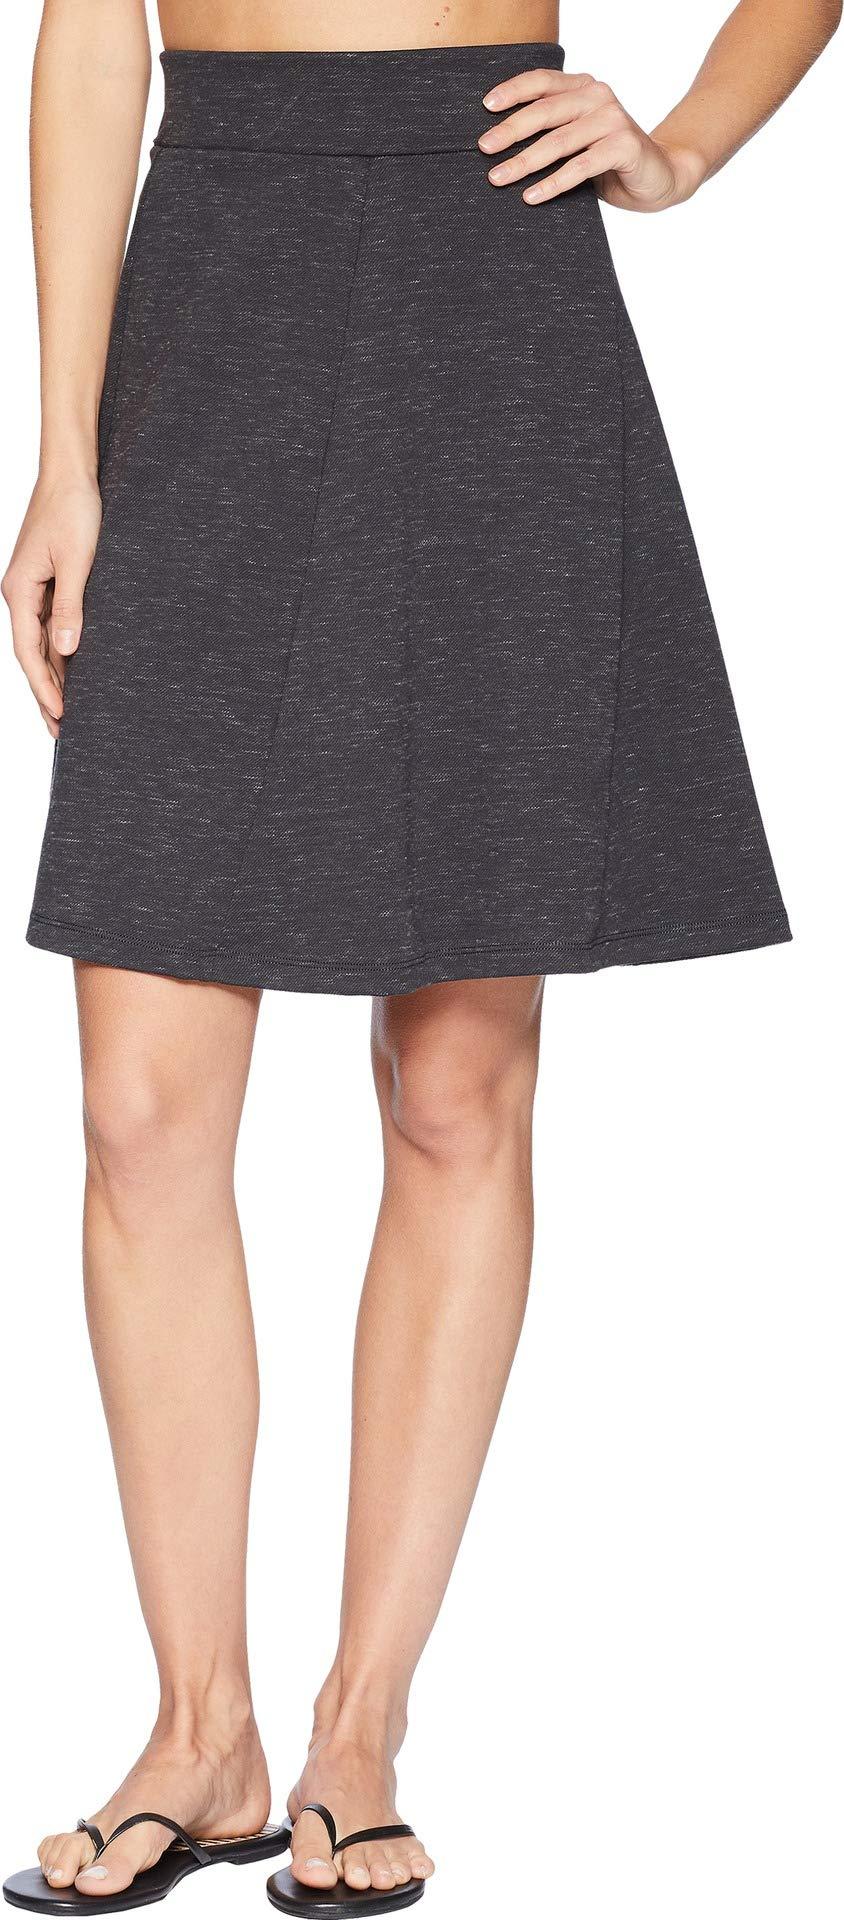 Royal Robbins Women's Geneva Ponte Skirt, Large, Charcoal Heather by Royal Robbins